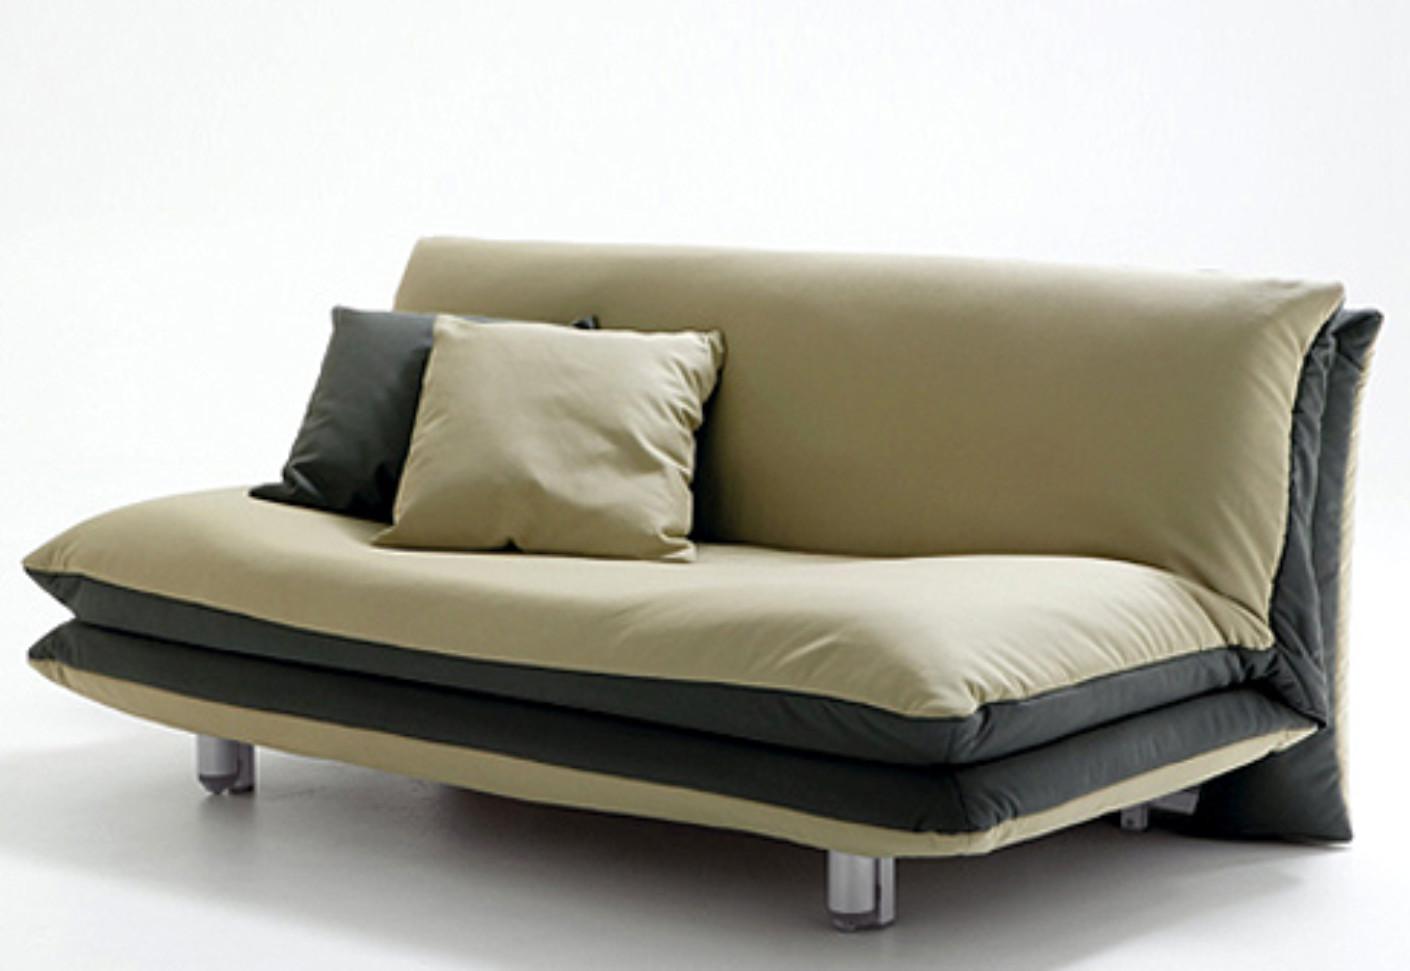 ligne roset nomade sofa cinema bed beds - thesofa